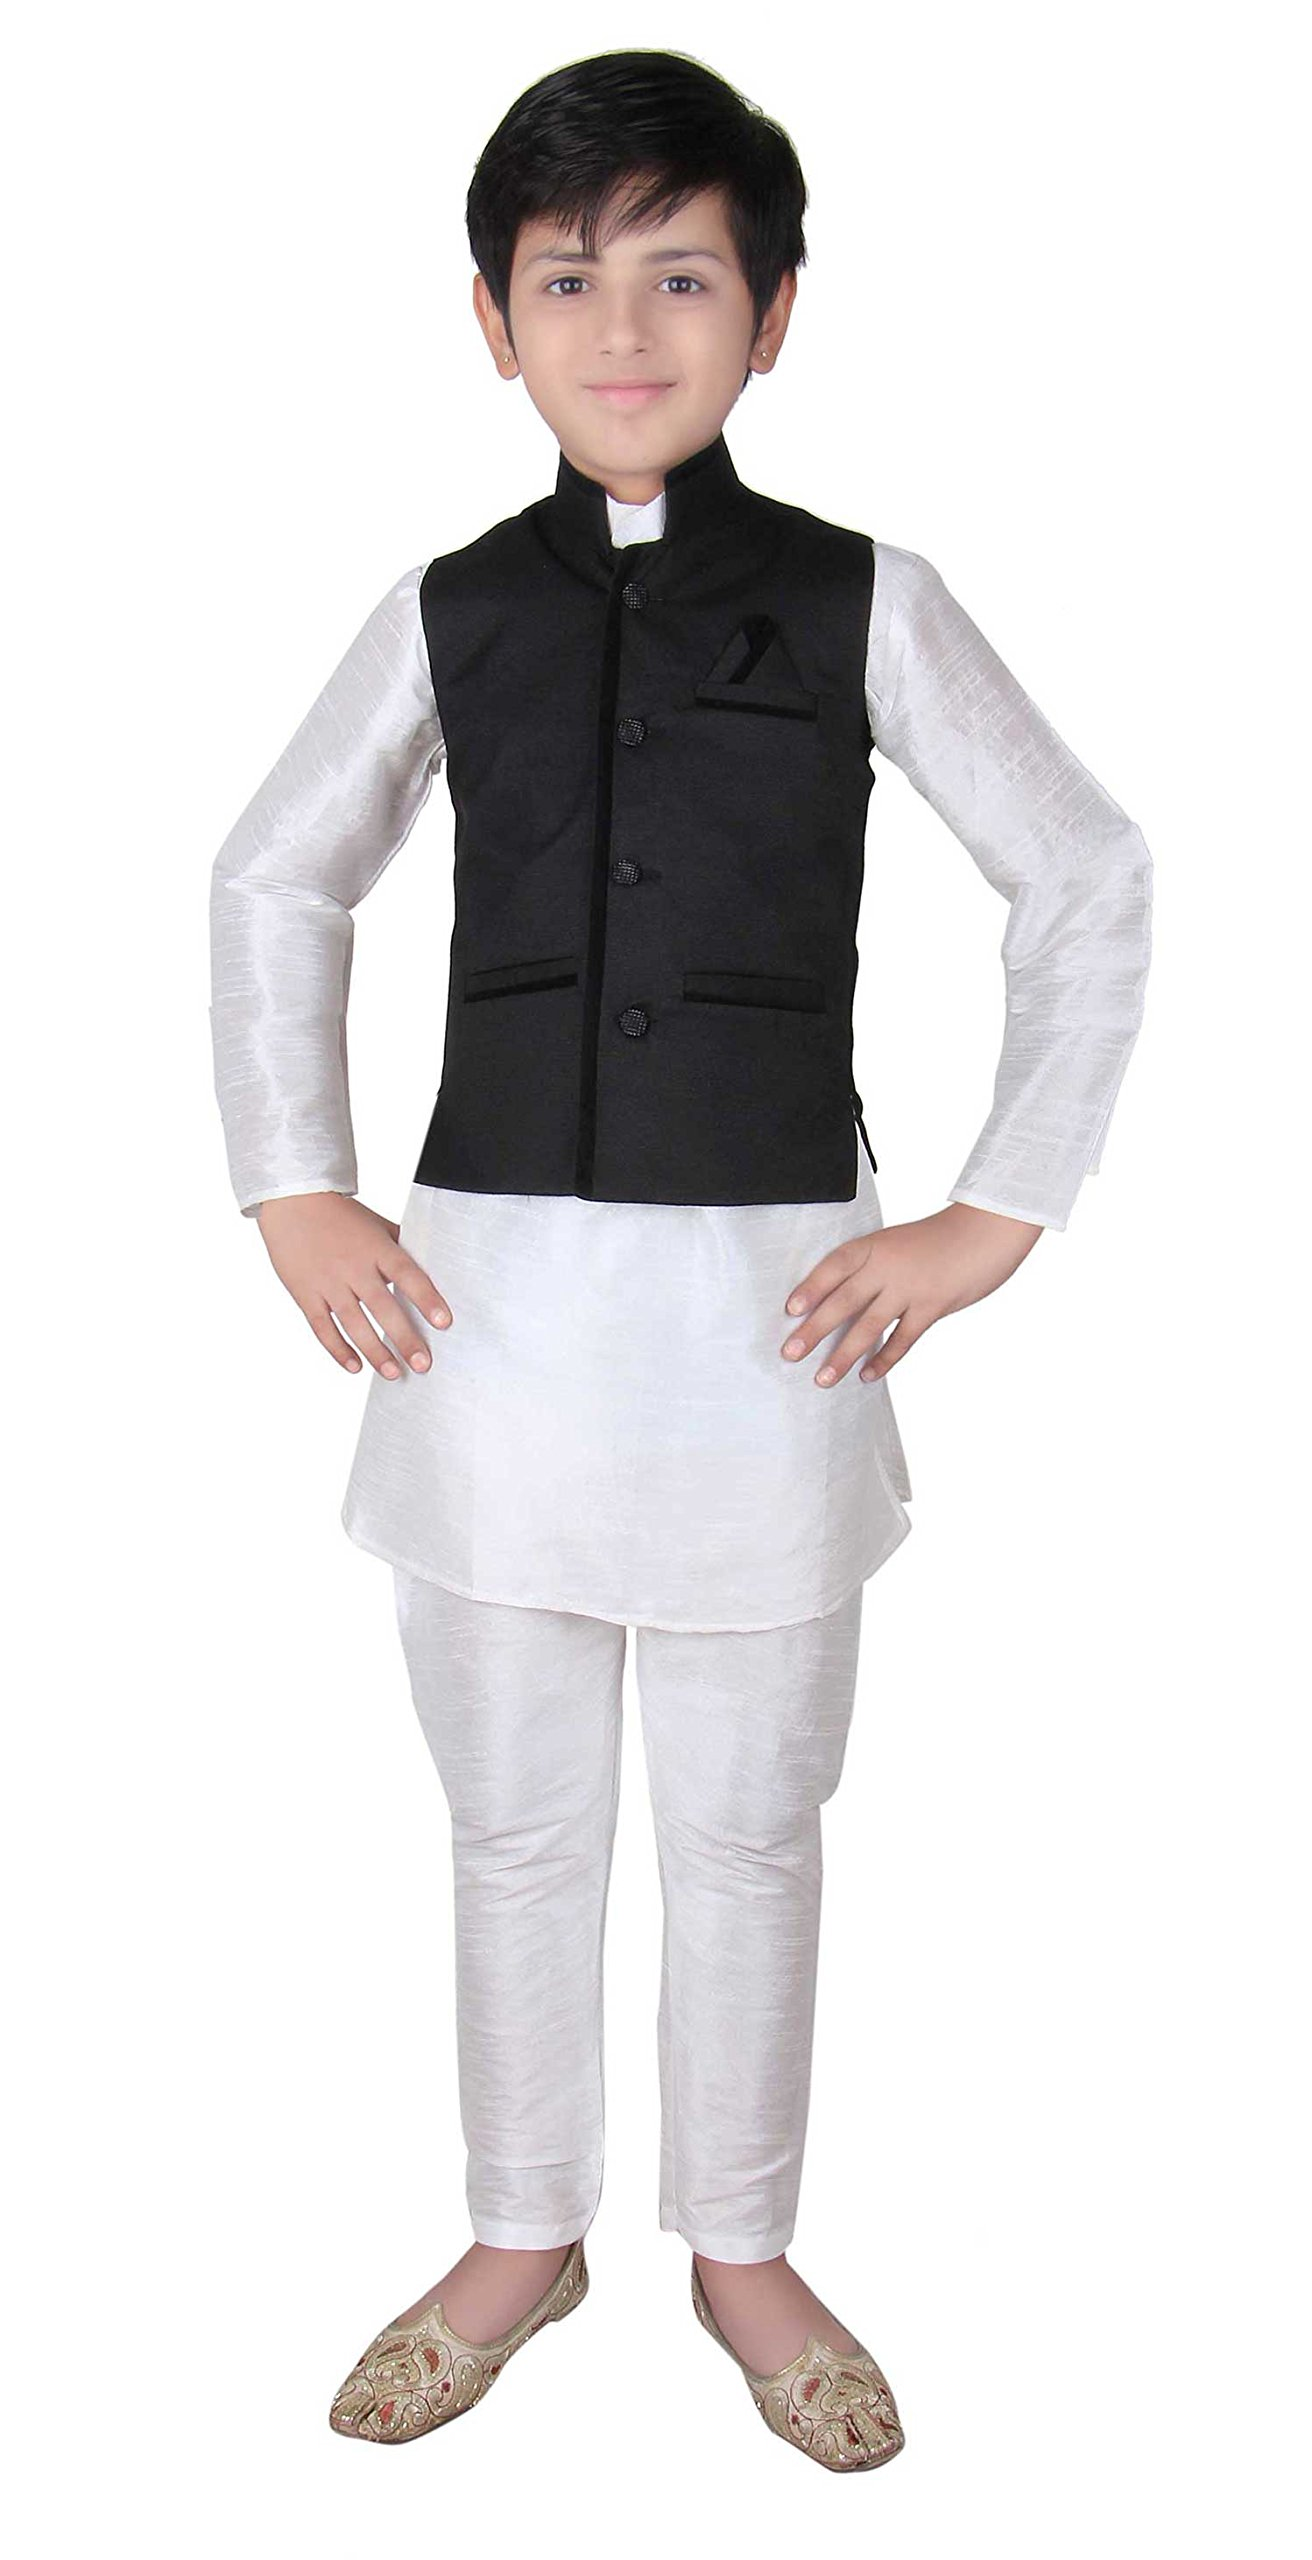 Boys Indian Modi Nehru Style Waistcoat for shalwar kameez for Bollywood theme party shops London 001 (13 (13 yrs), Black)